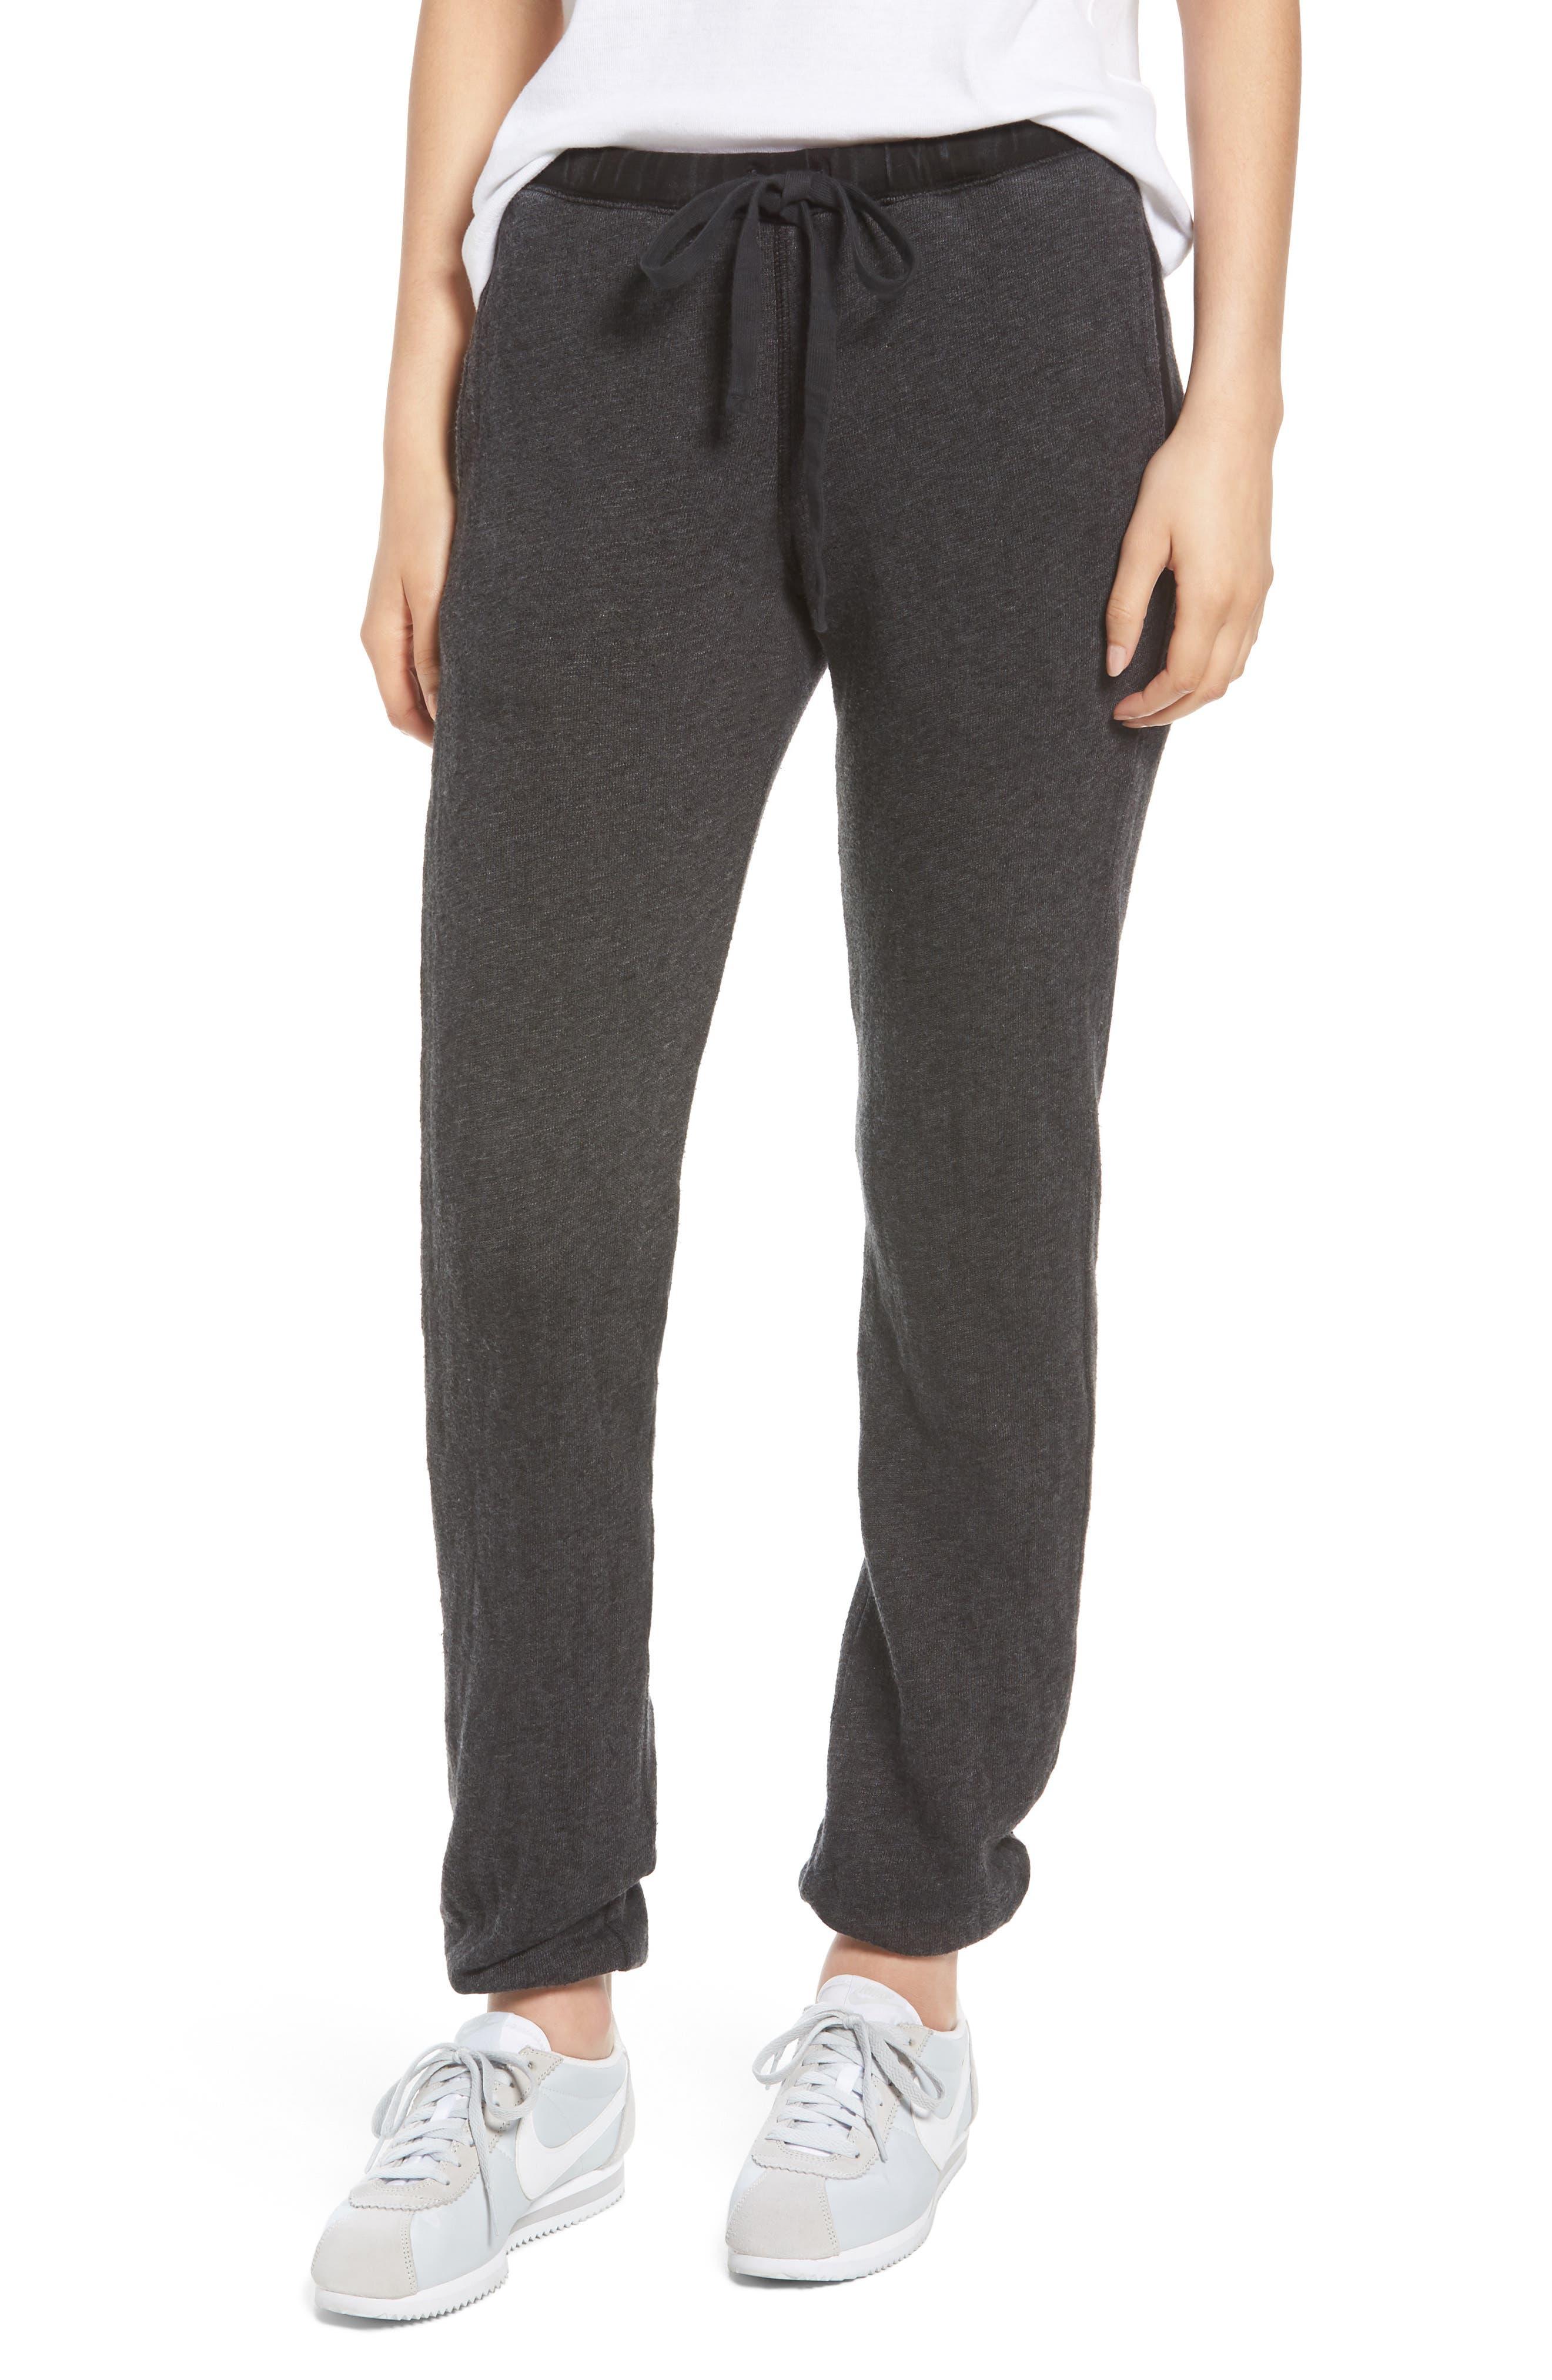 Kiama Lounge Pants,                             Main thumbnail 1, color,                             Mw Black